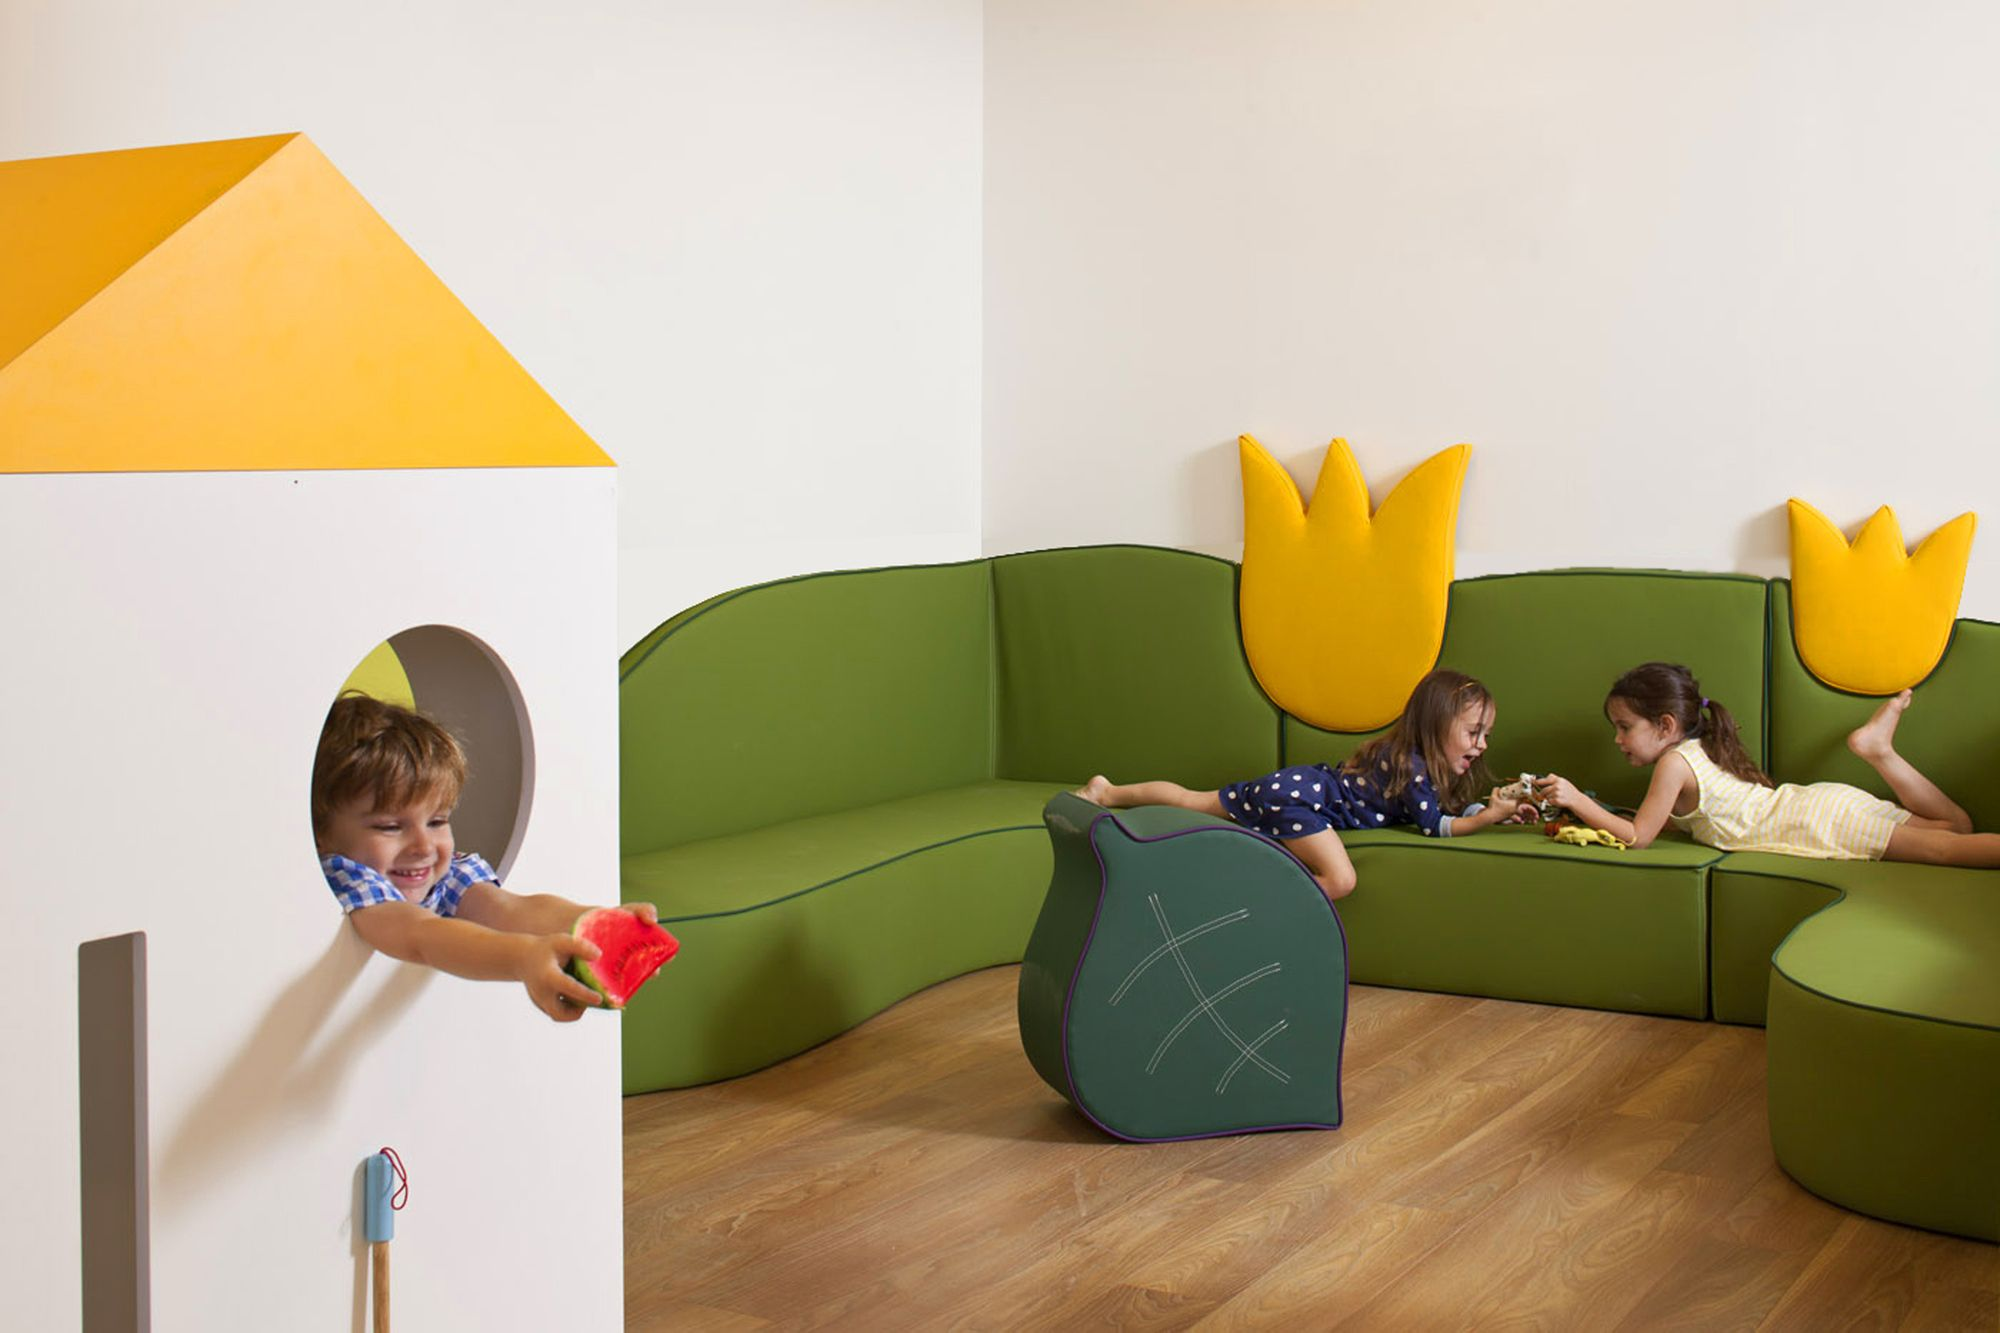 Galeria - Jardim de Infância Kfar Shemaryahu / Sarit Shani Hay - 151